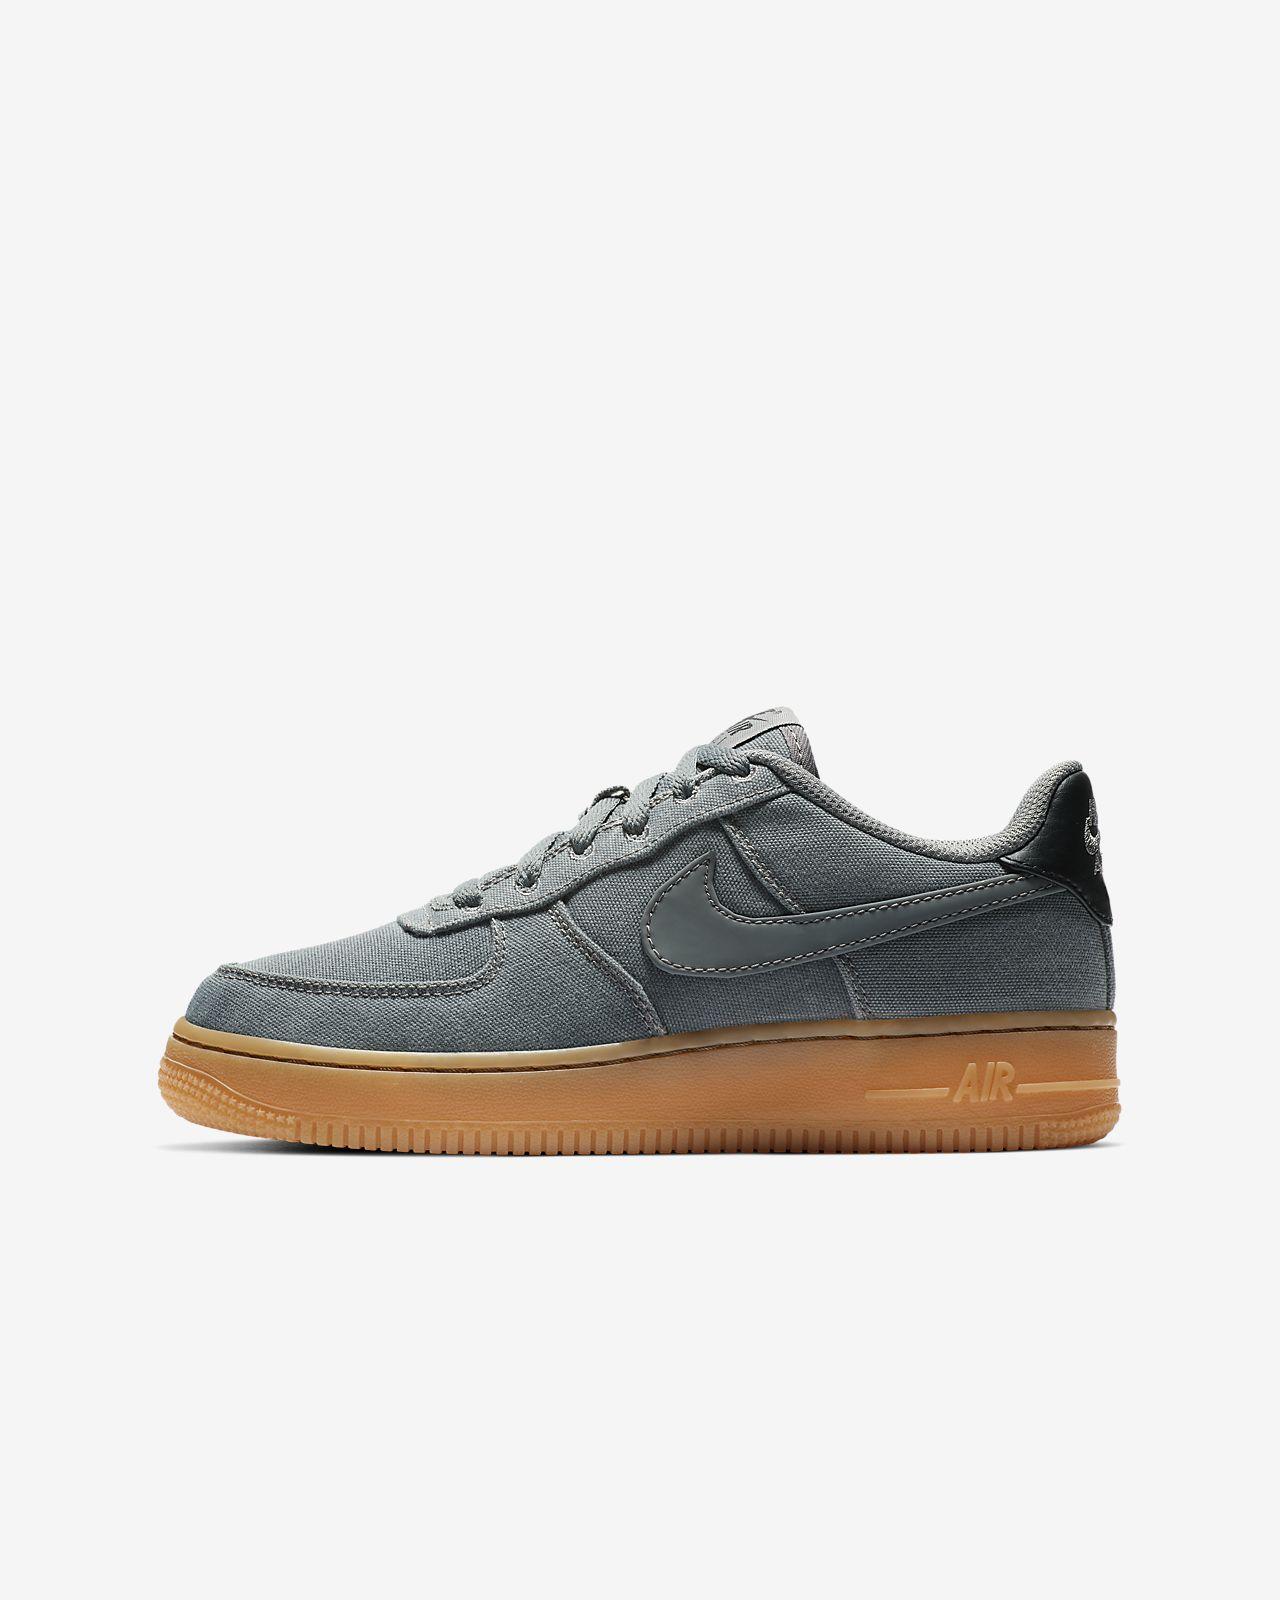 Nike Air Force 1 LV8 Style Kinderschoen